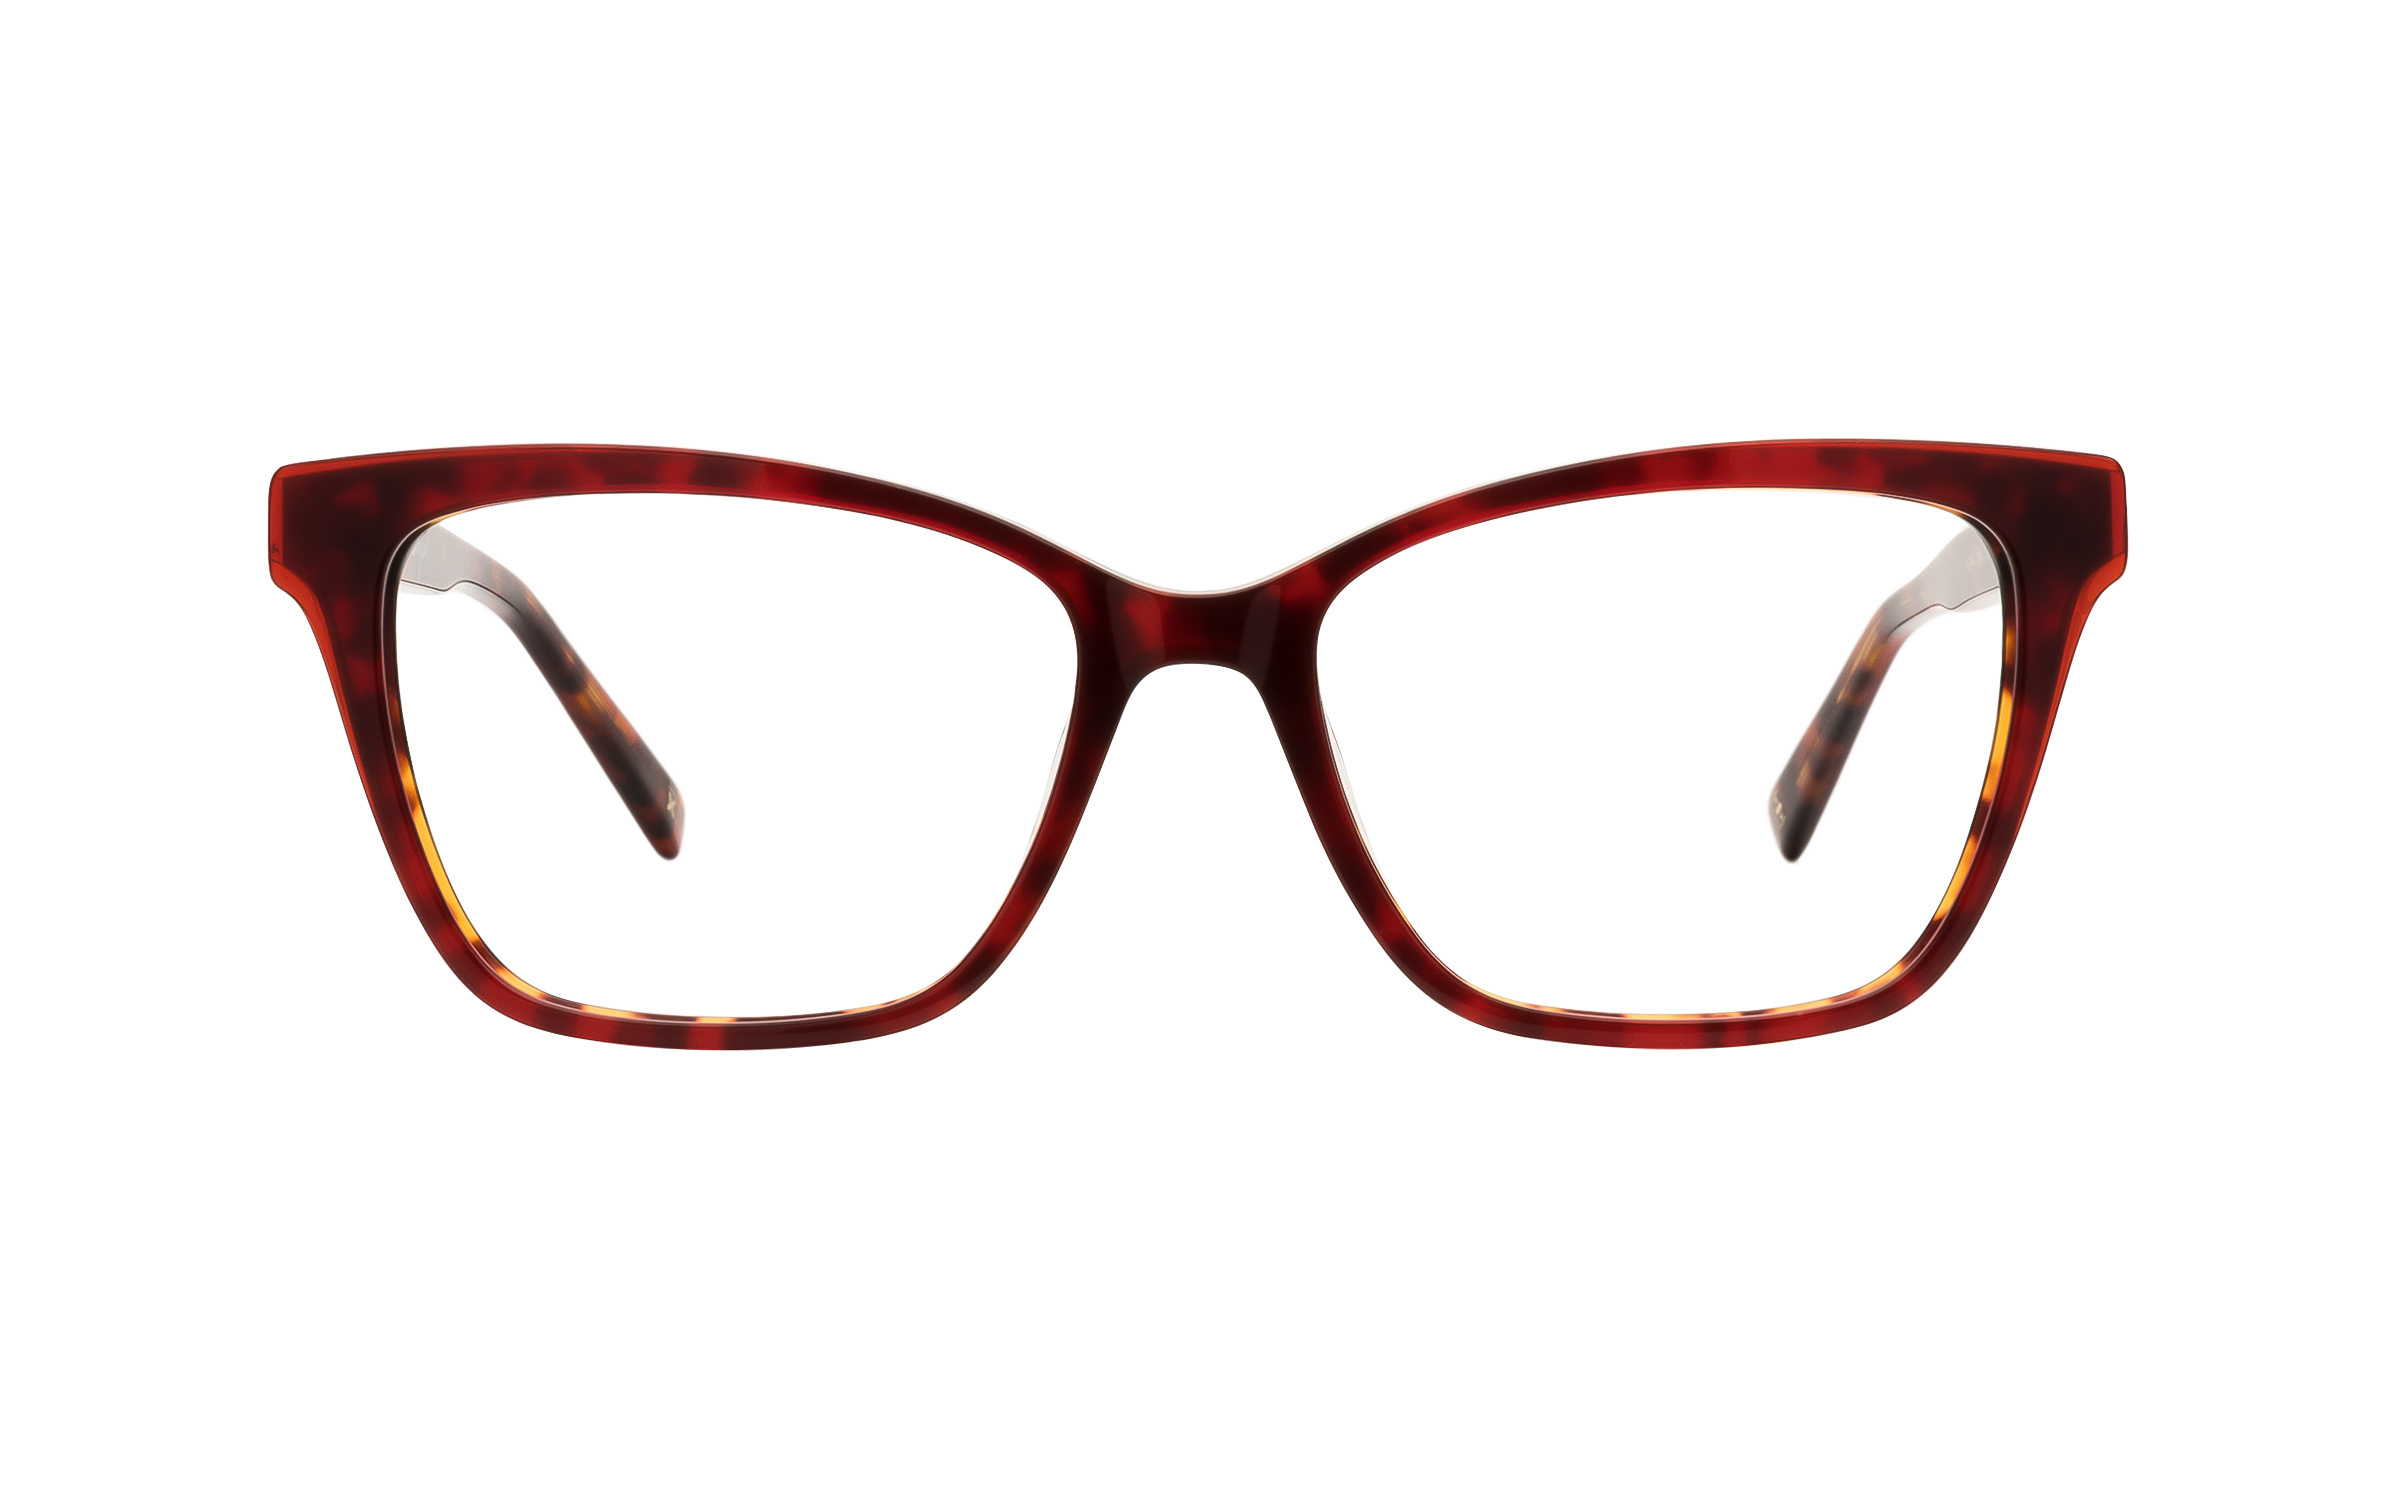 Derek_Cardigan_Womens_Glasses_DFrame_RedTortoise_Acetate_Online_Coastal